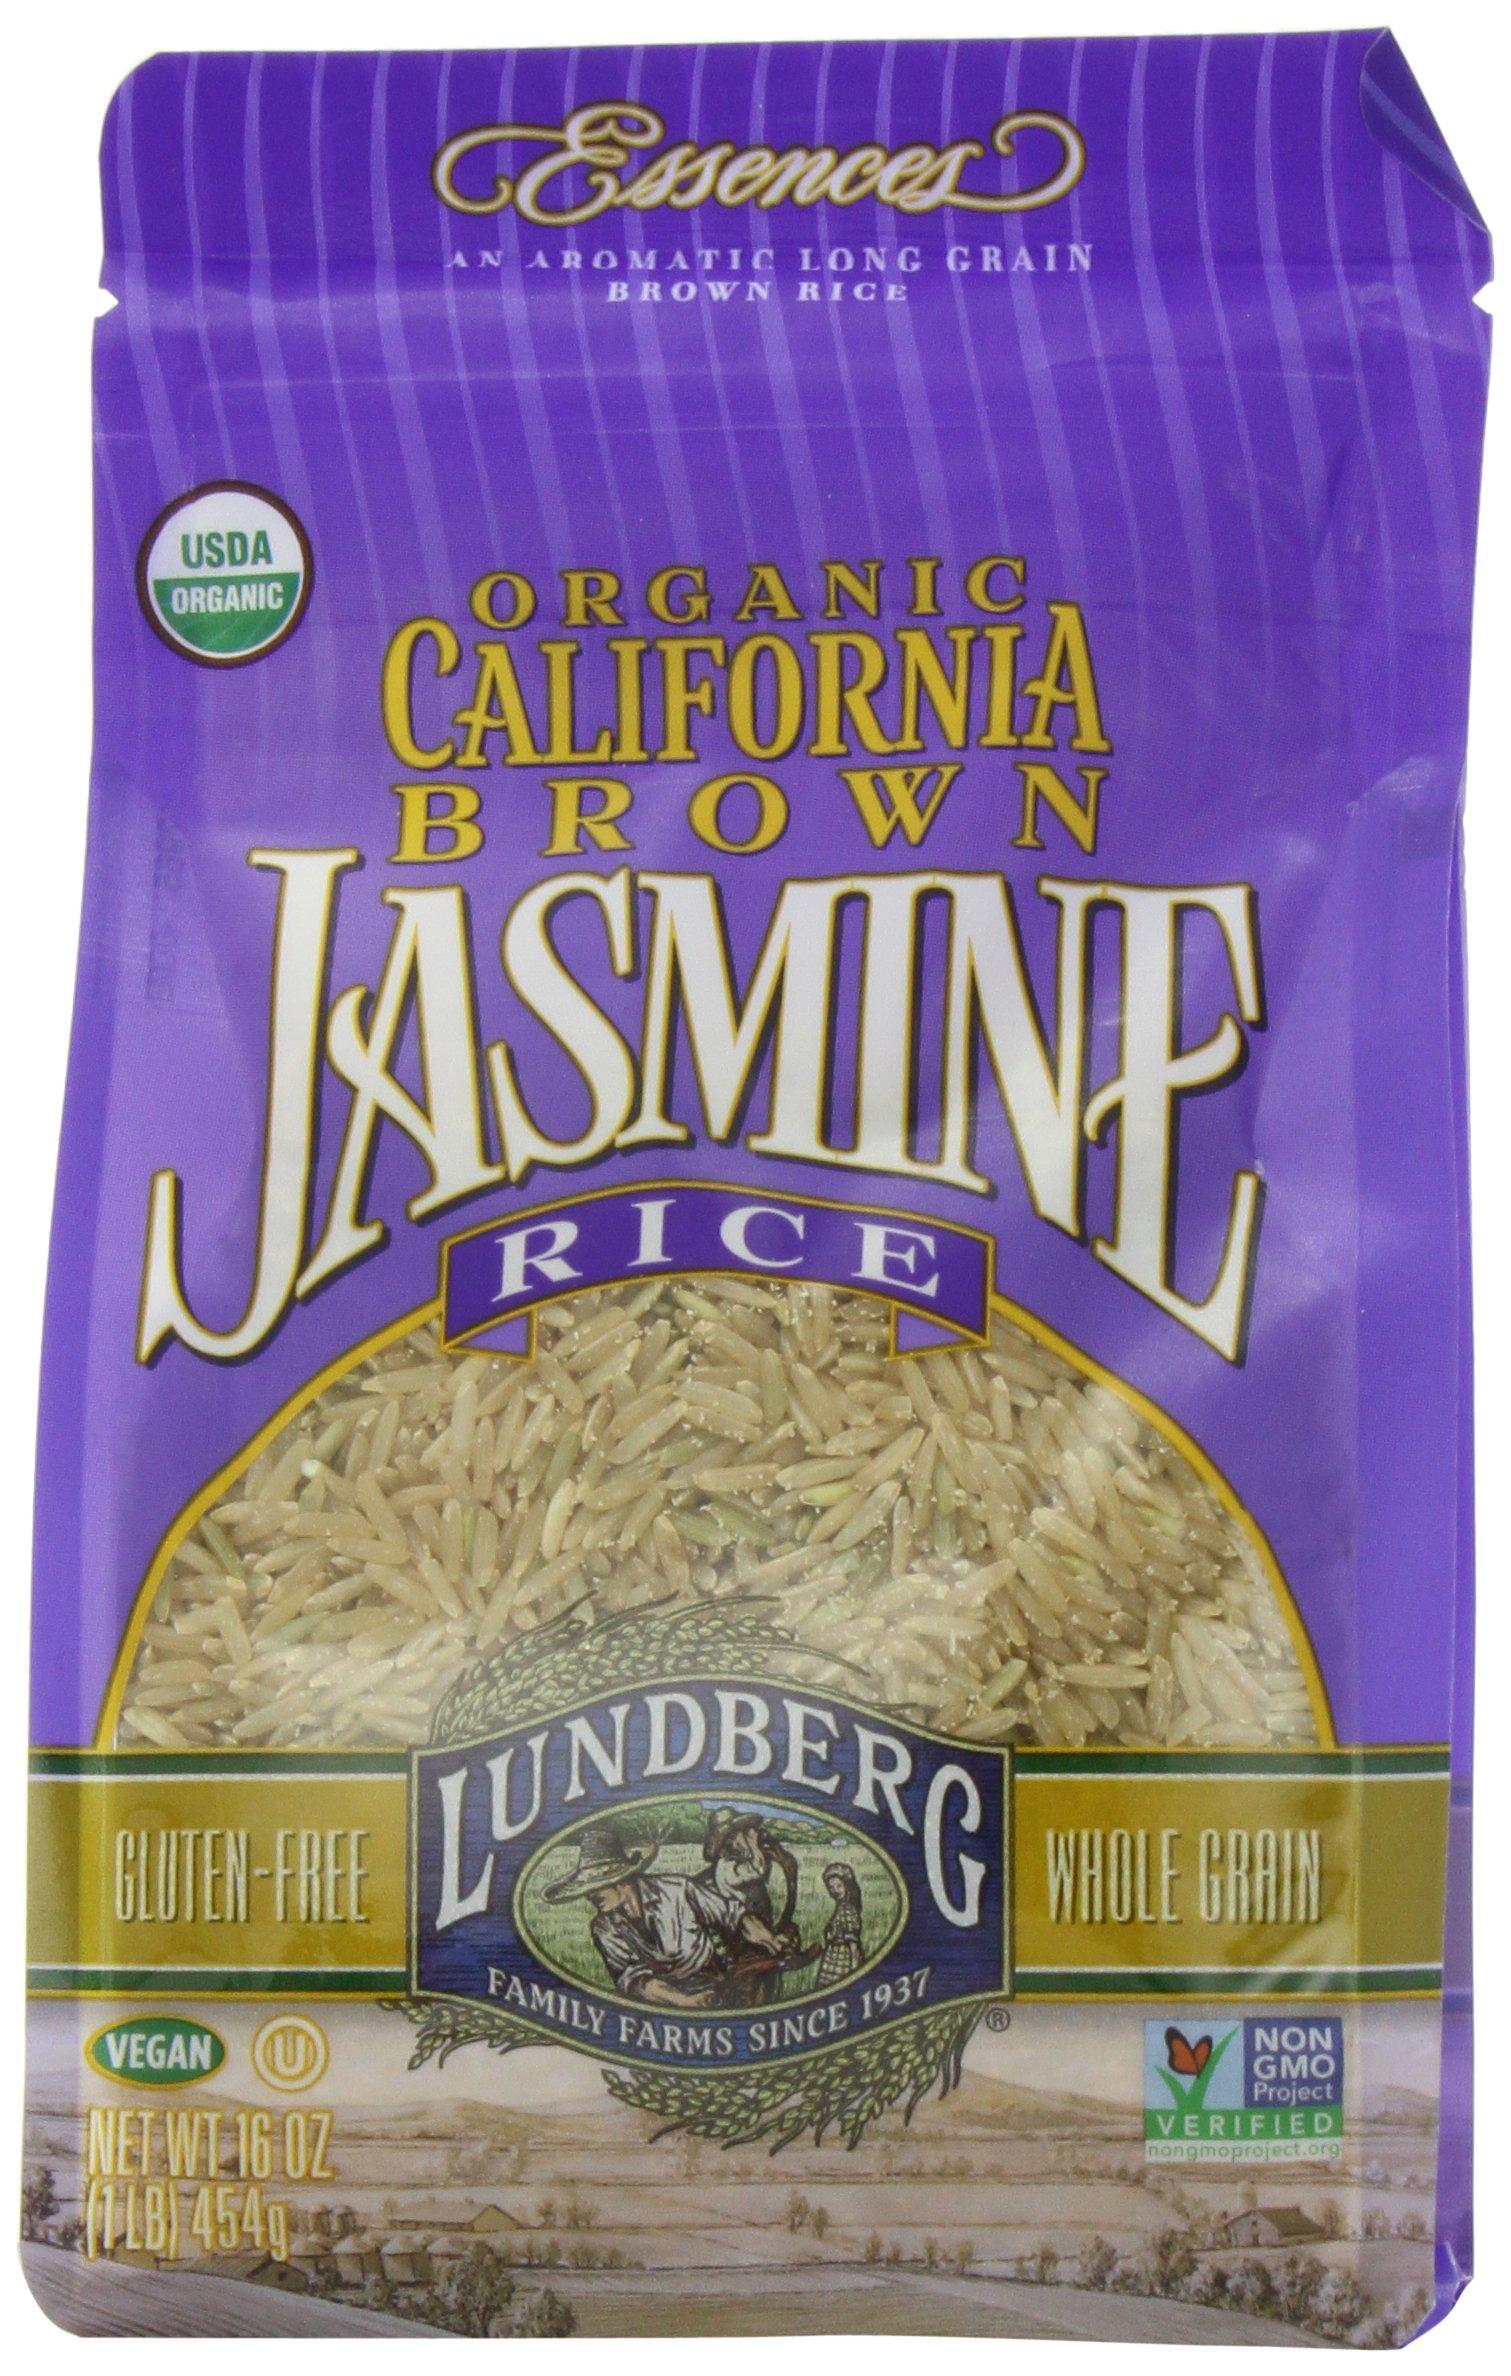 Lundberg Family Farms Organic Jasmine Rice, California Brown, 16 Ounce (Pack of 6)